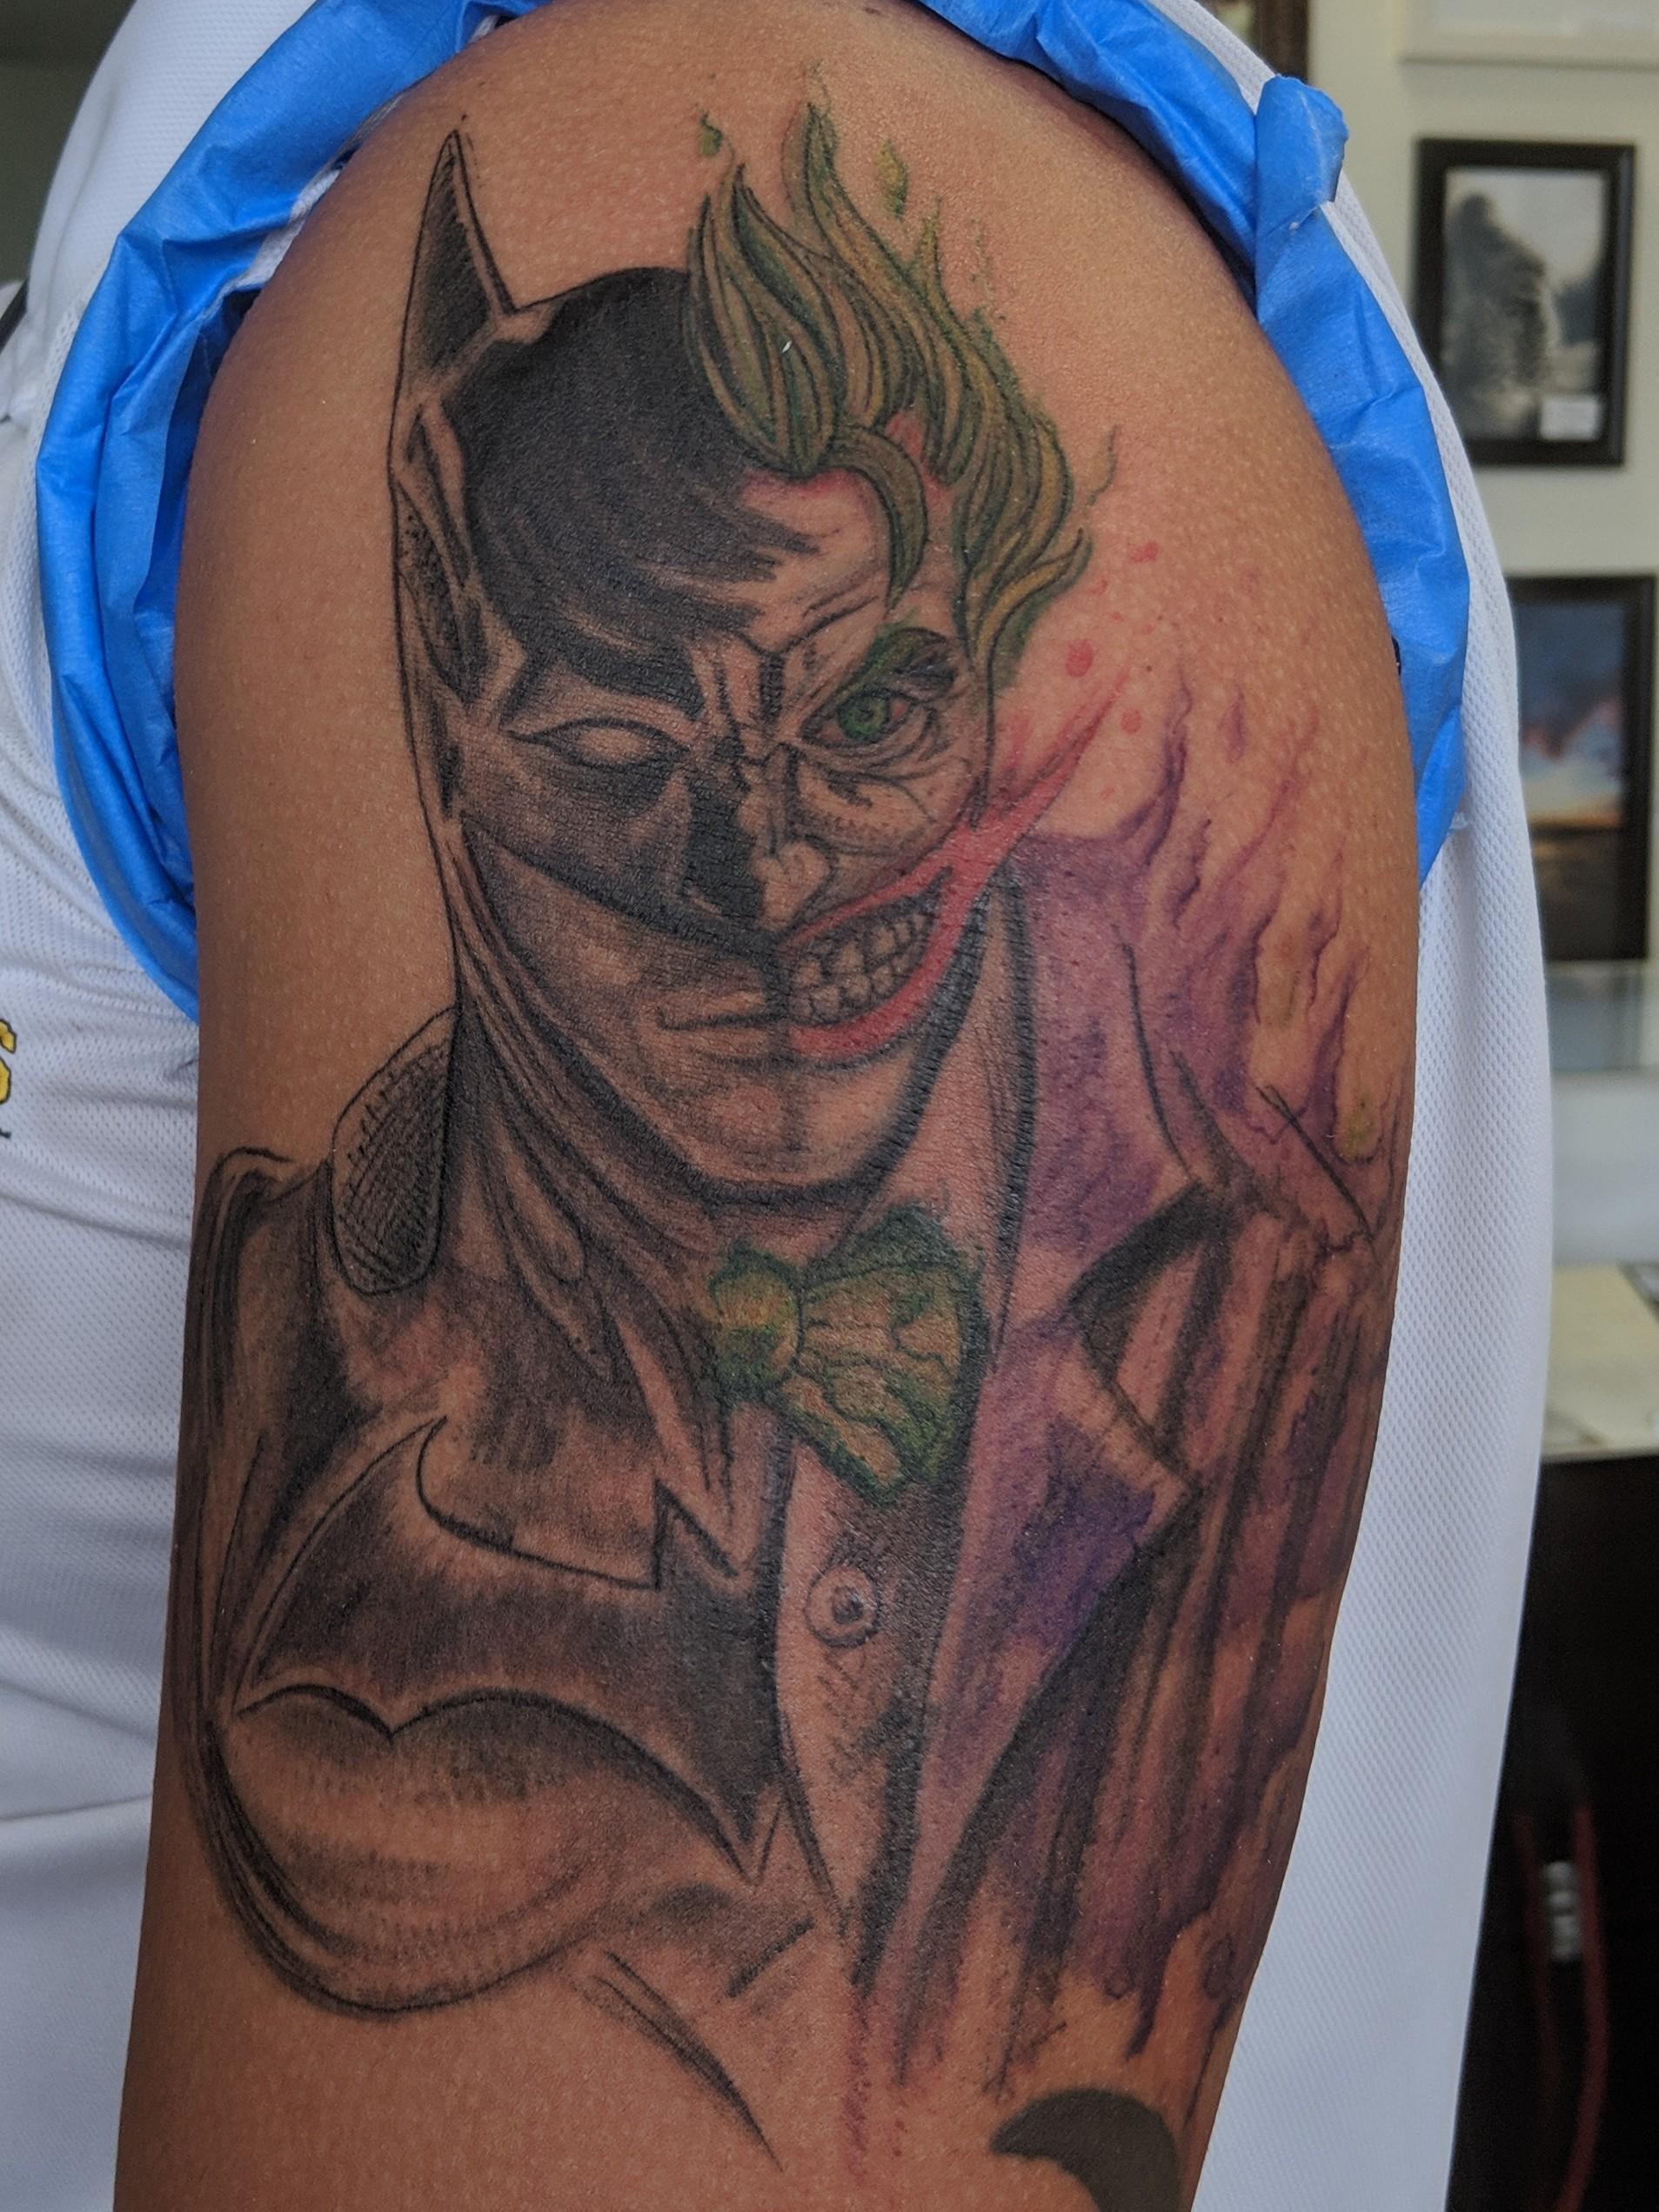 Batman Joker Tattoo : batman, joker, tattoo, Batman/Joker, Tattoo, Batman